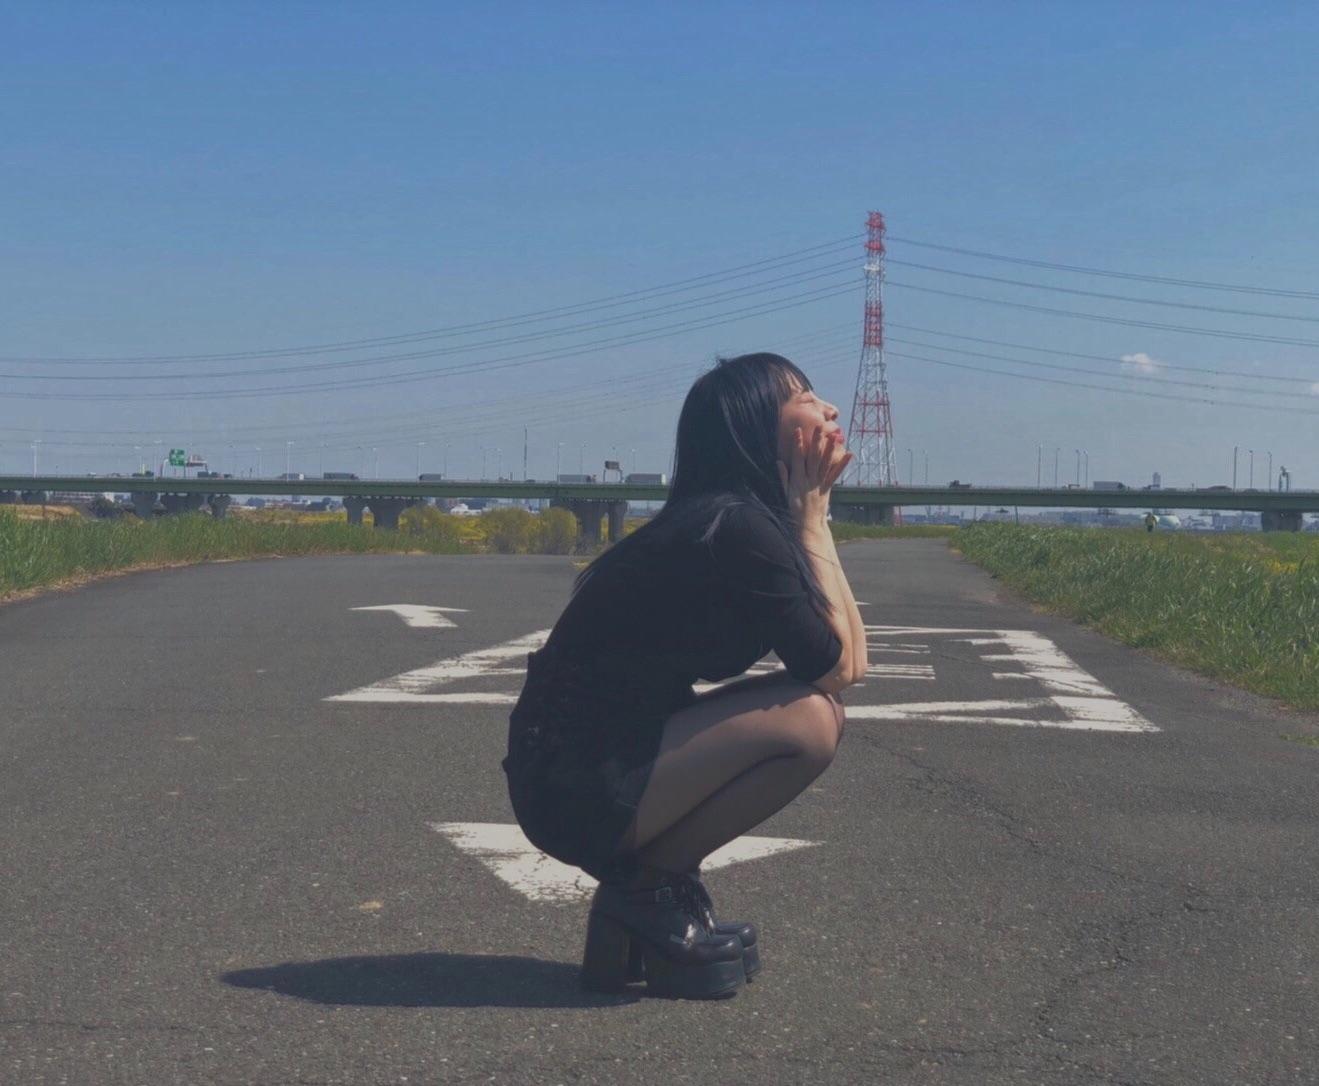 f:id:mitsuki_3838:20200407090941j:image